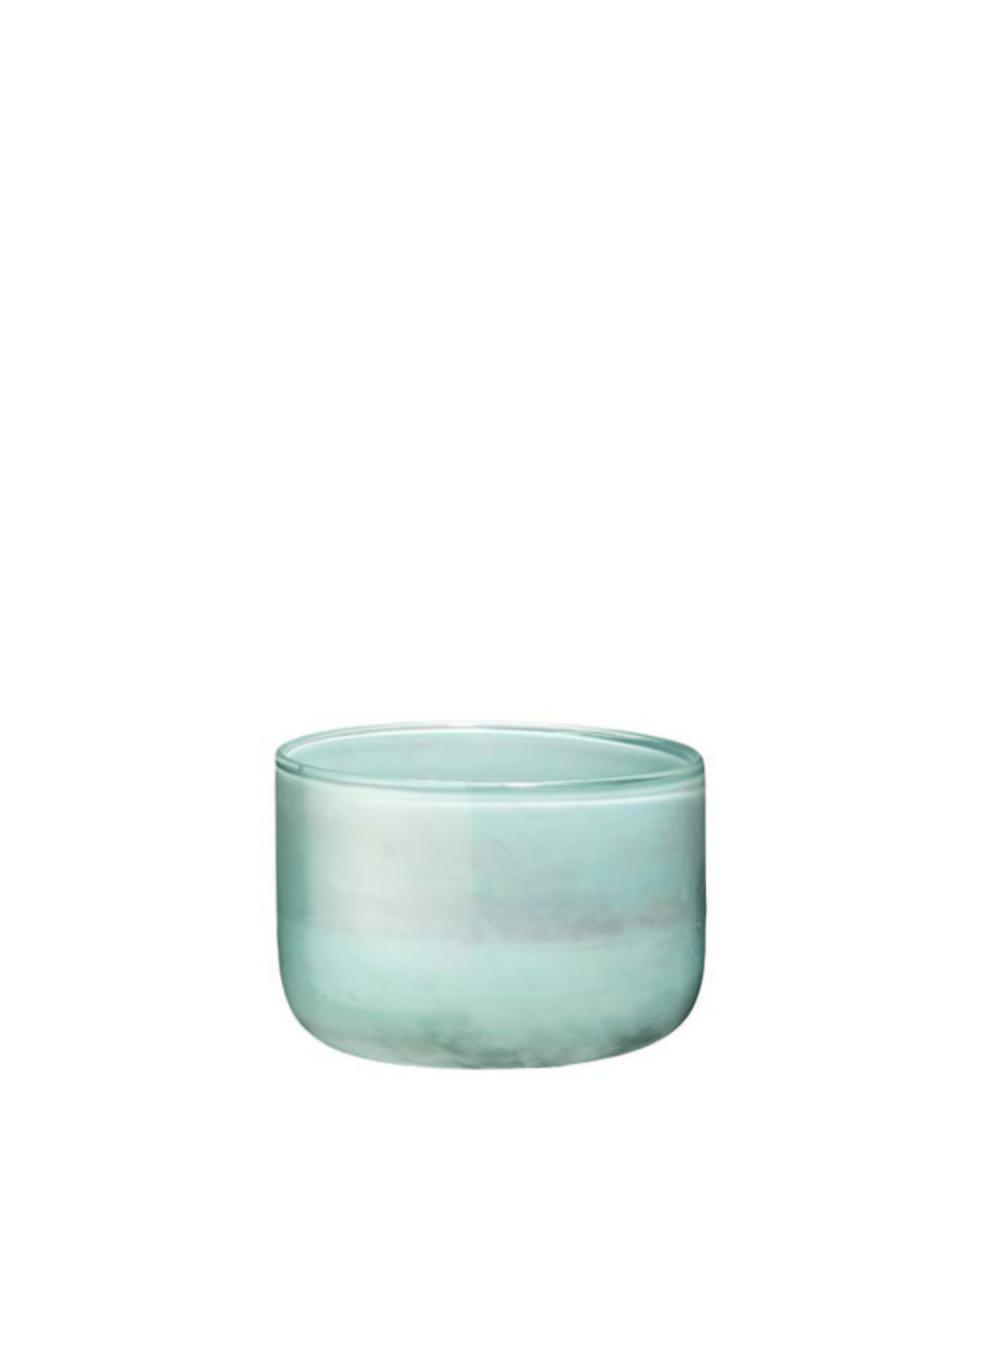 Jamie Young - Vapor Vase